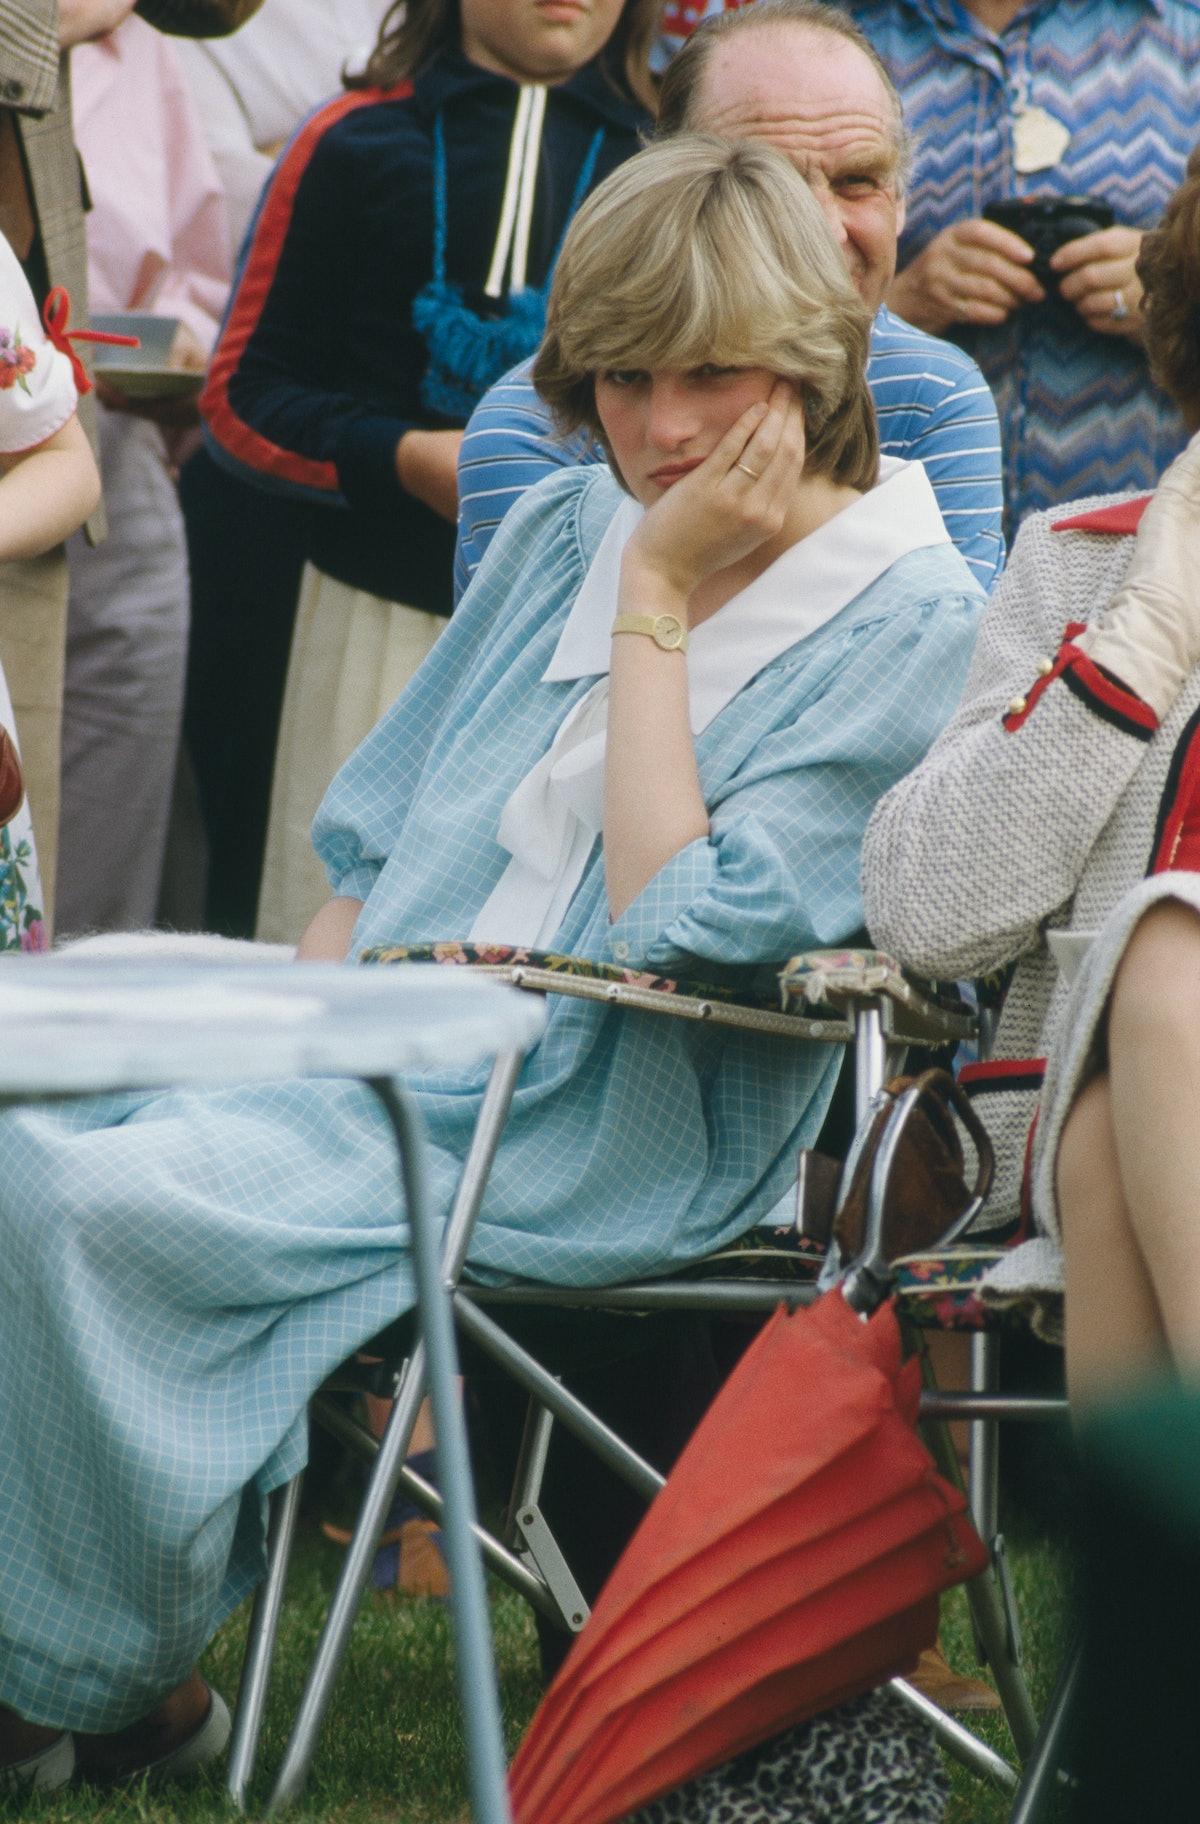 Princess Diana looking grumpy